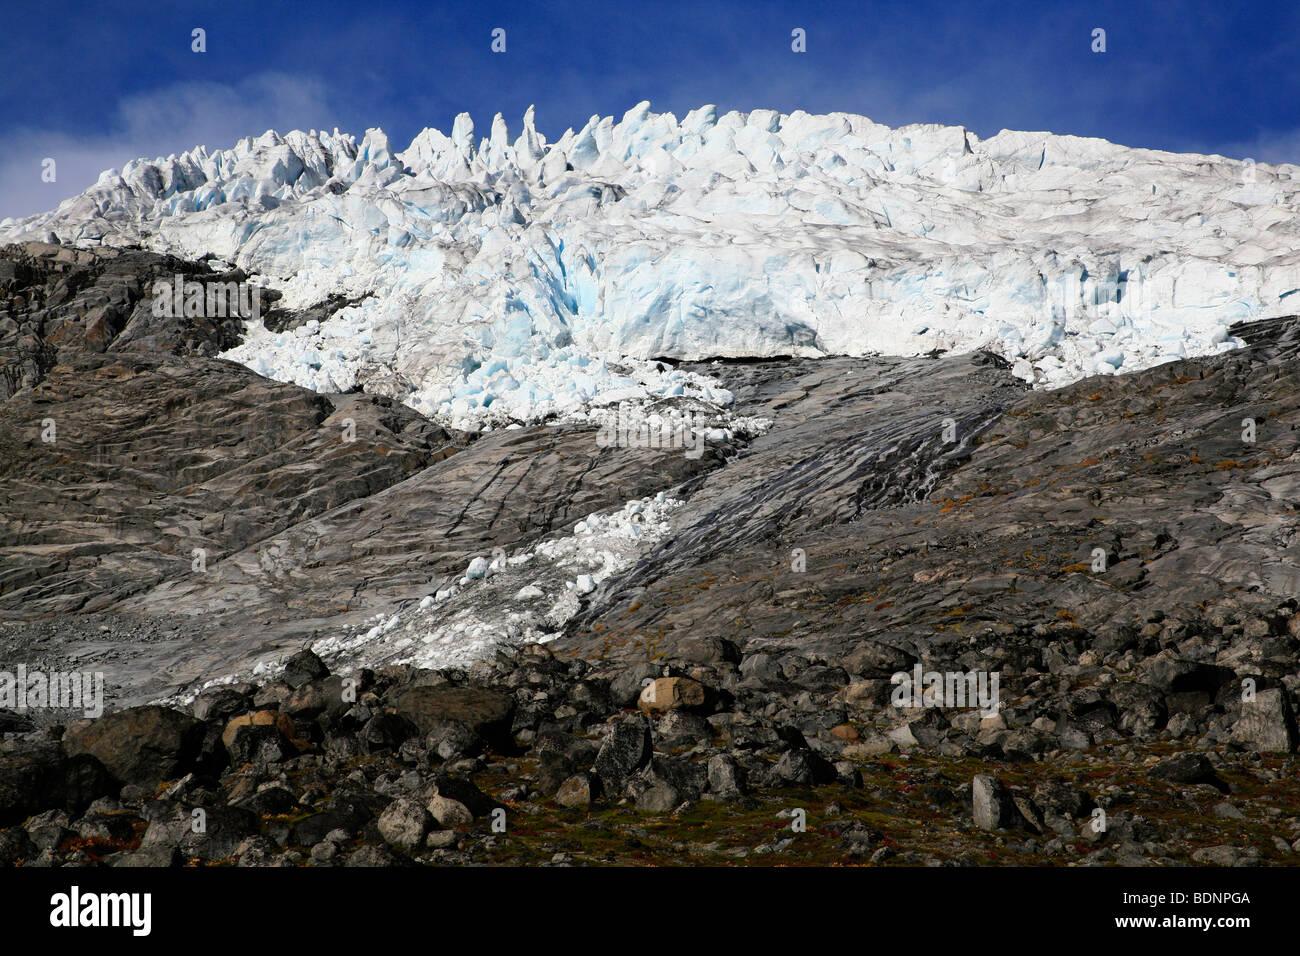 Galdhøpiggen Styggebreen Glacier from the Visdalen ascent in the Jotunheimen National Park, Oppland, Norway, - Stock Image